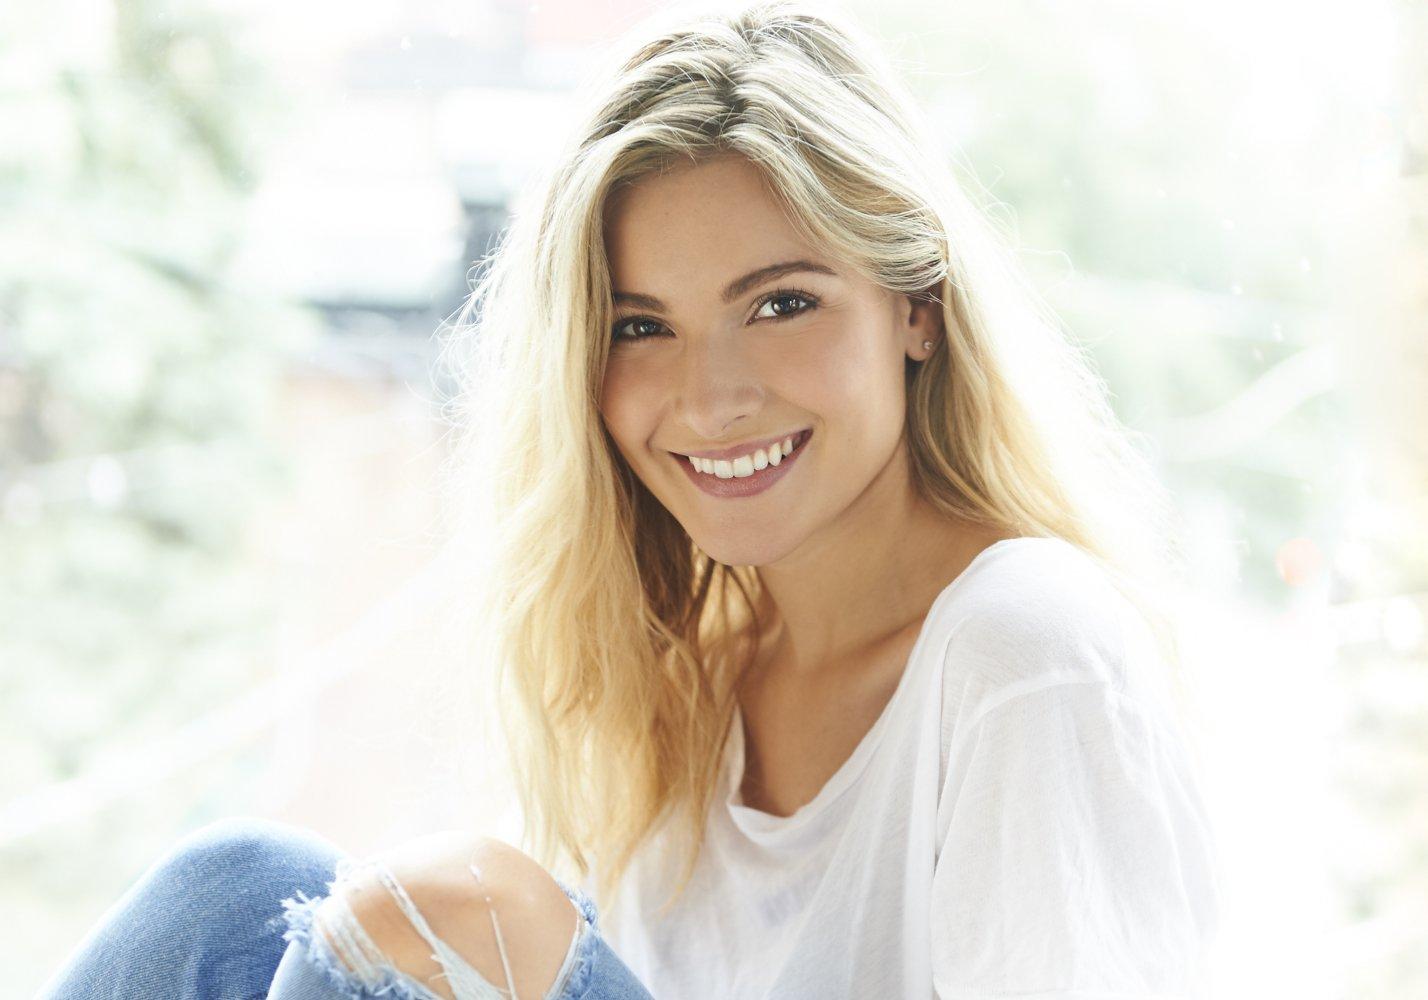 Kalinka Petrie